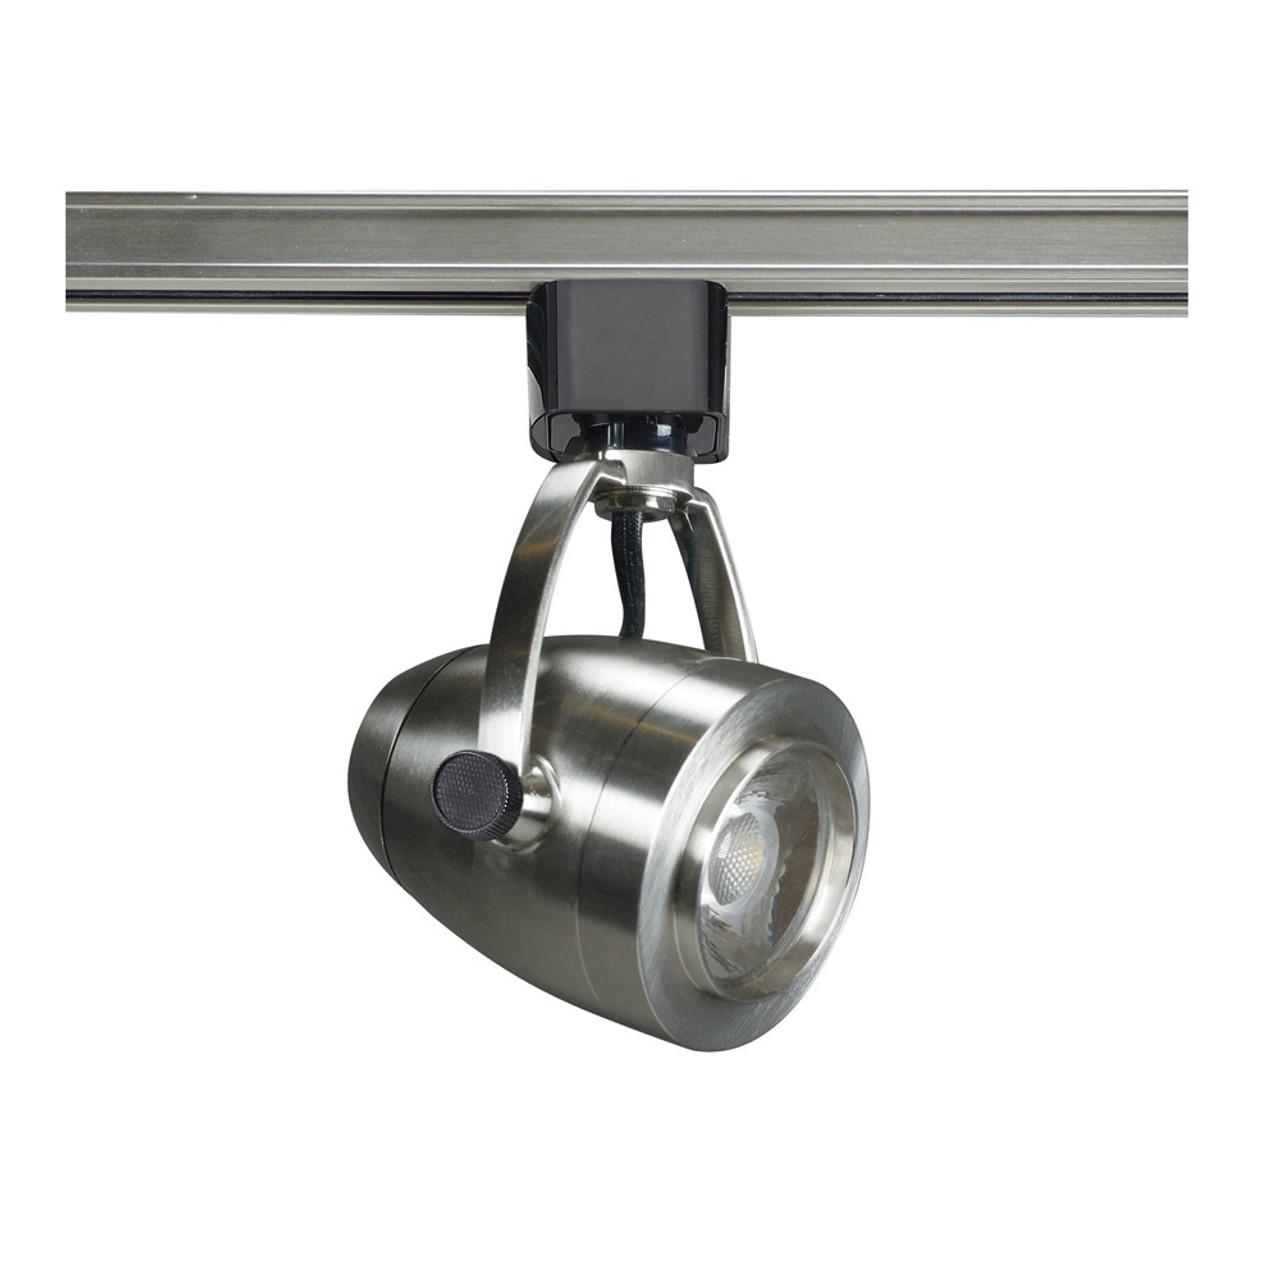 Decorative Track Lighting Fixtures: Decorative LED Track Lighting Fixture